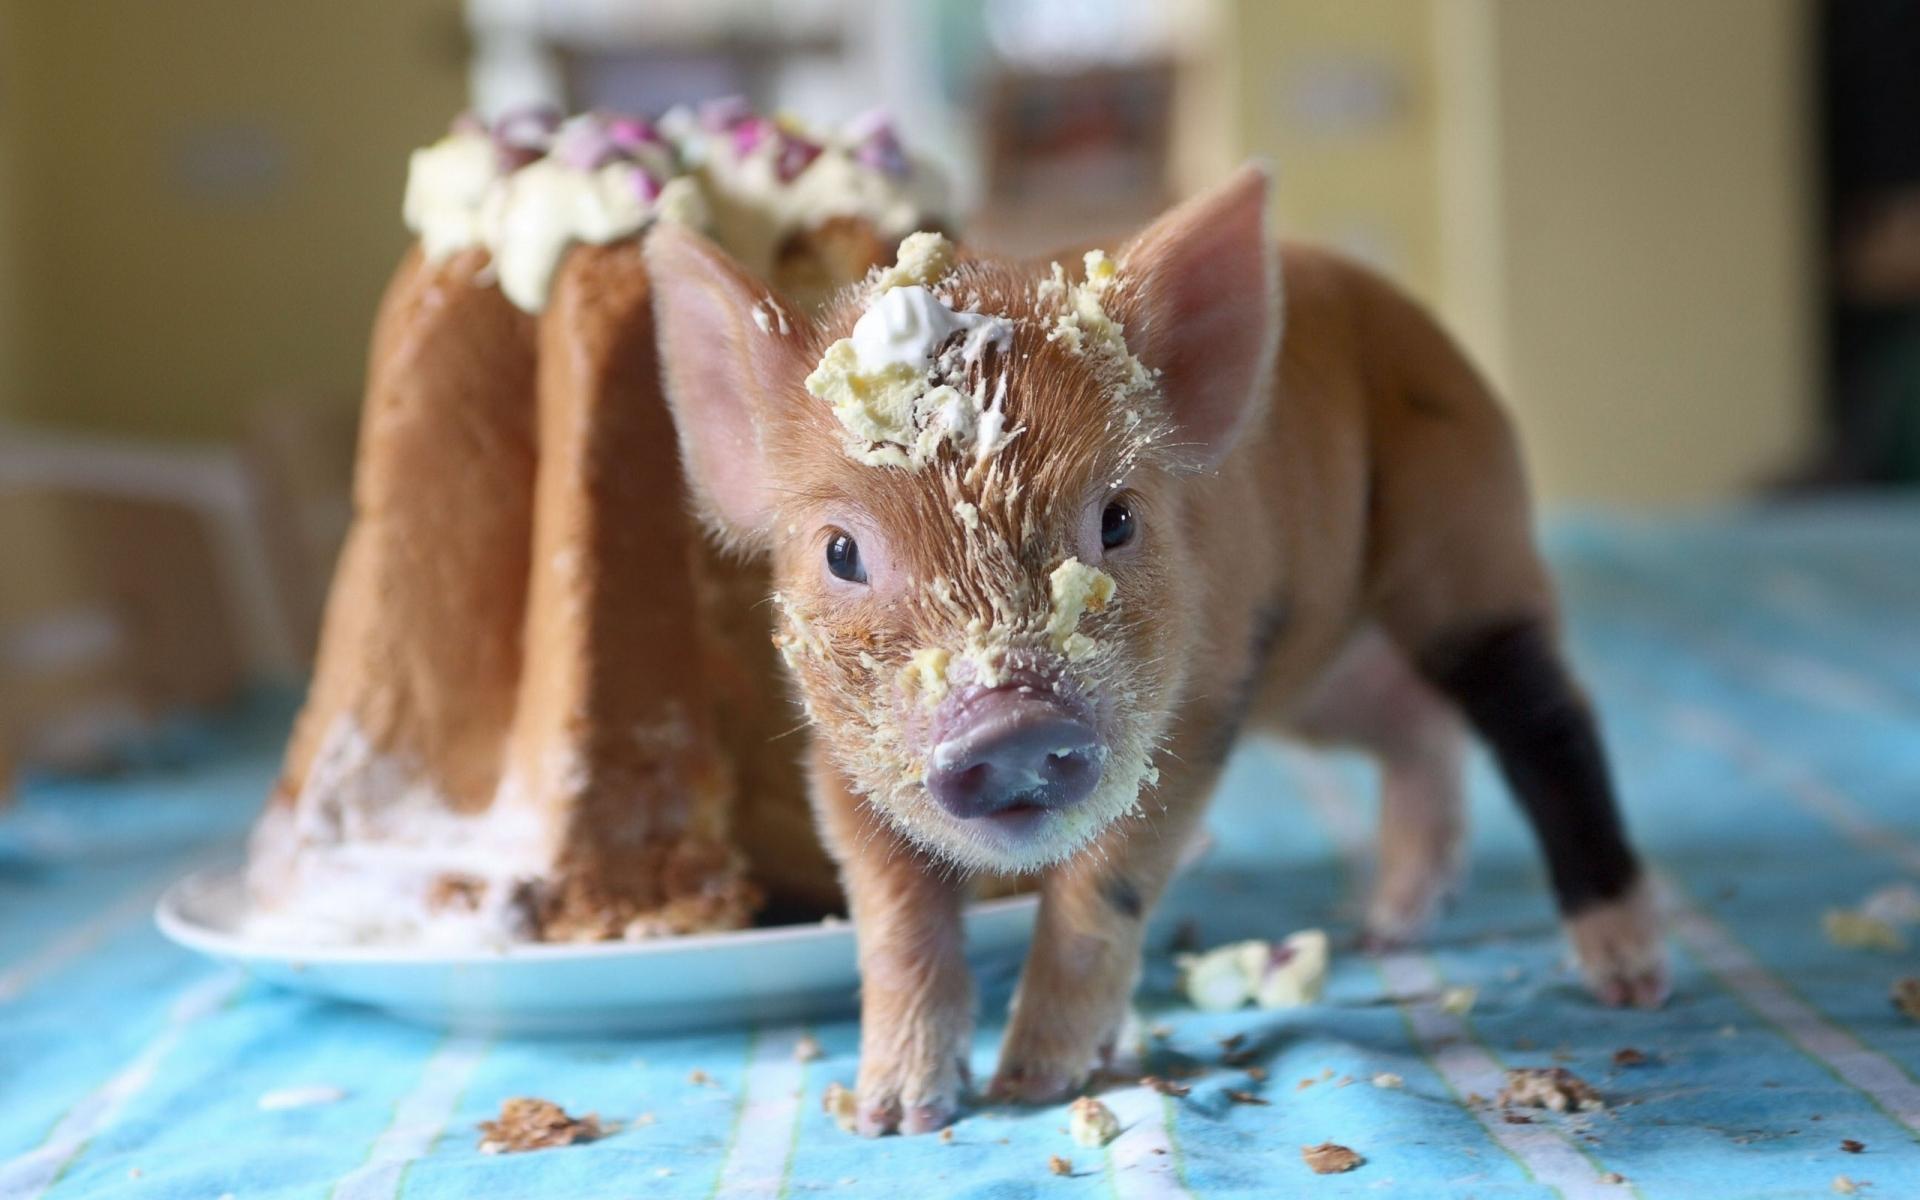 pig, cake, soiled Wallpaper in 1920x1200 Resolution